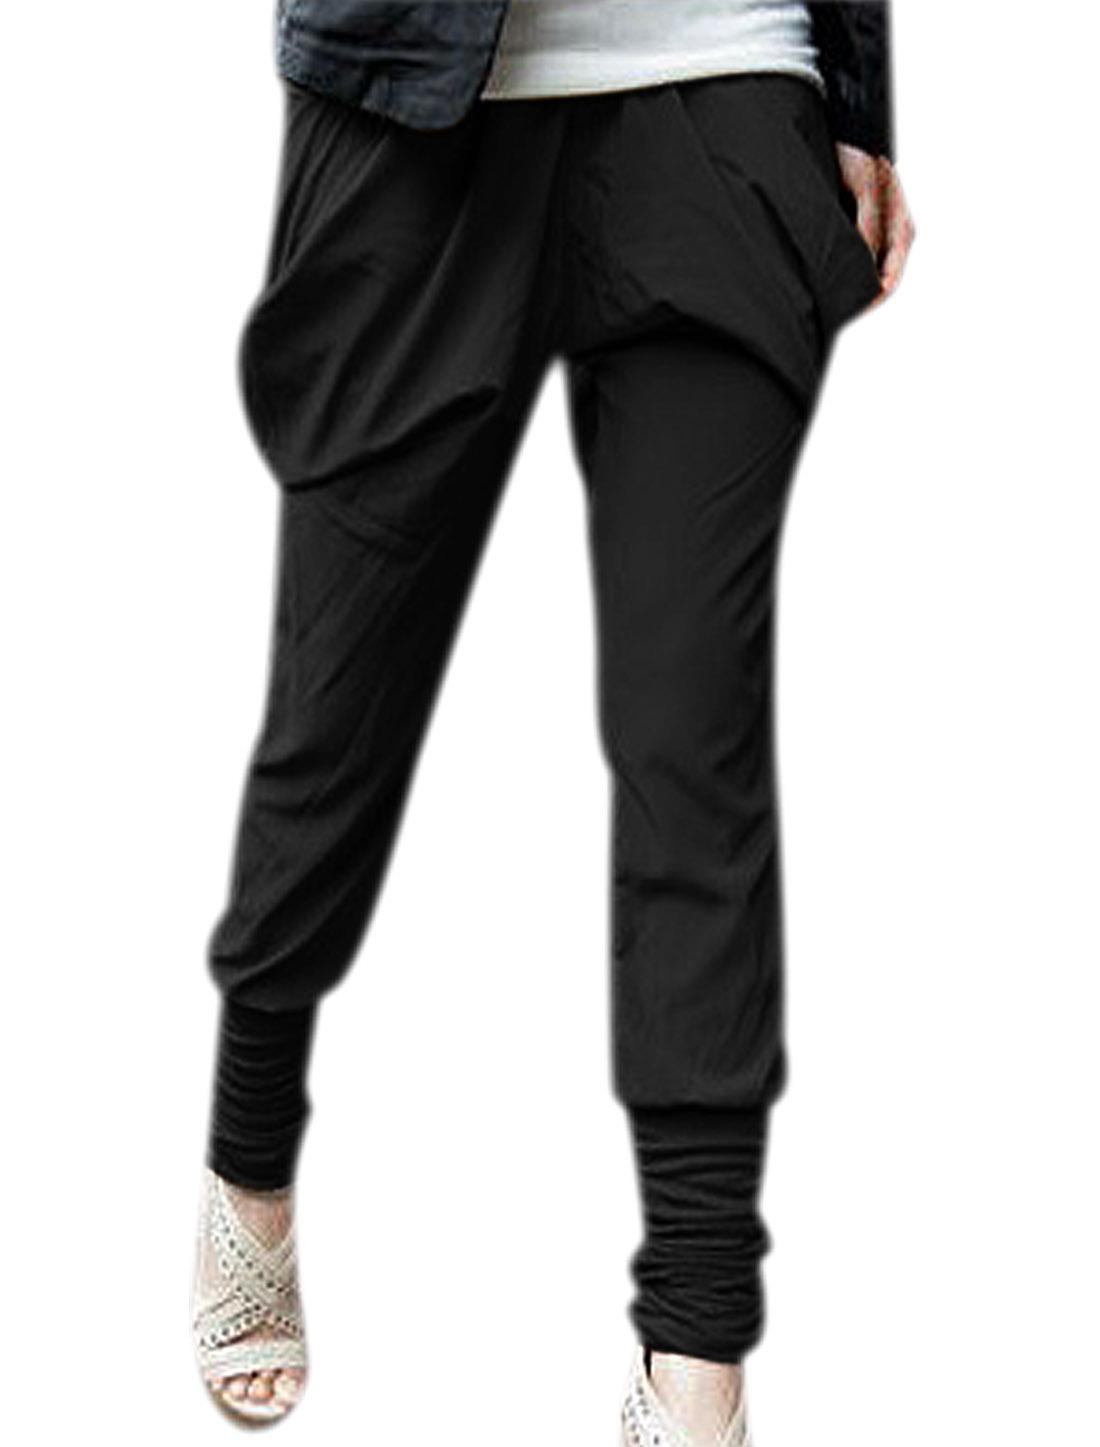 Ladies Two Pockets Elastic Waist Harem Pants Trousers Black XS